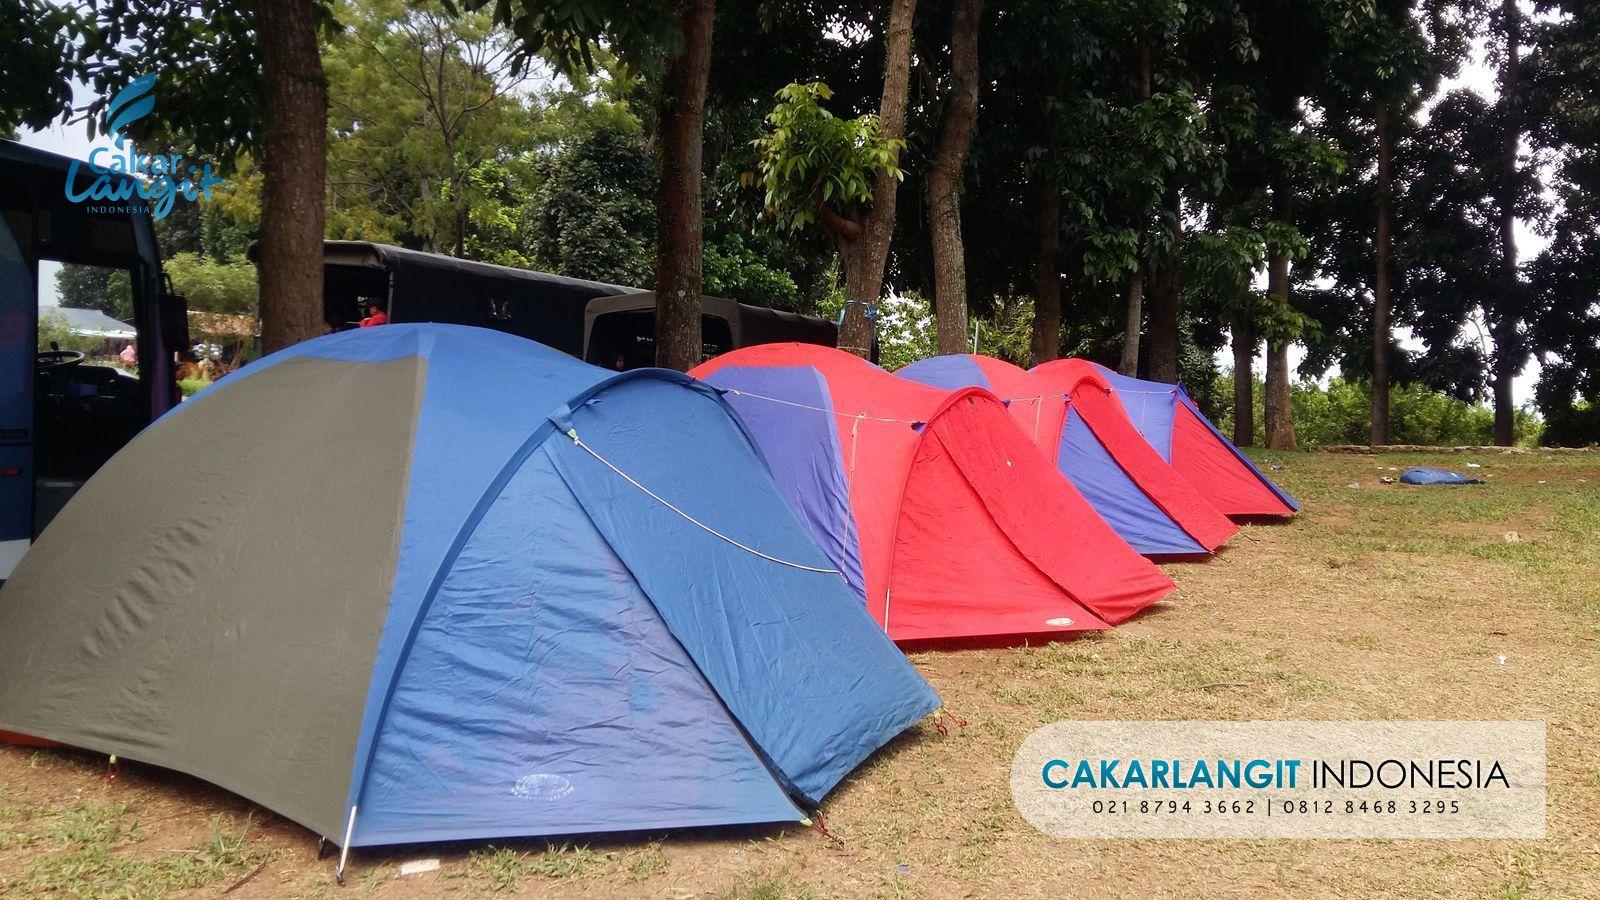 Cari Tempat Sewa Tenda Camping Dome Dan Peralatan Kemping Cakarlangit Ready Banyak Dekat Pasirkaliki Kota Cimahi0813845355000